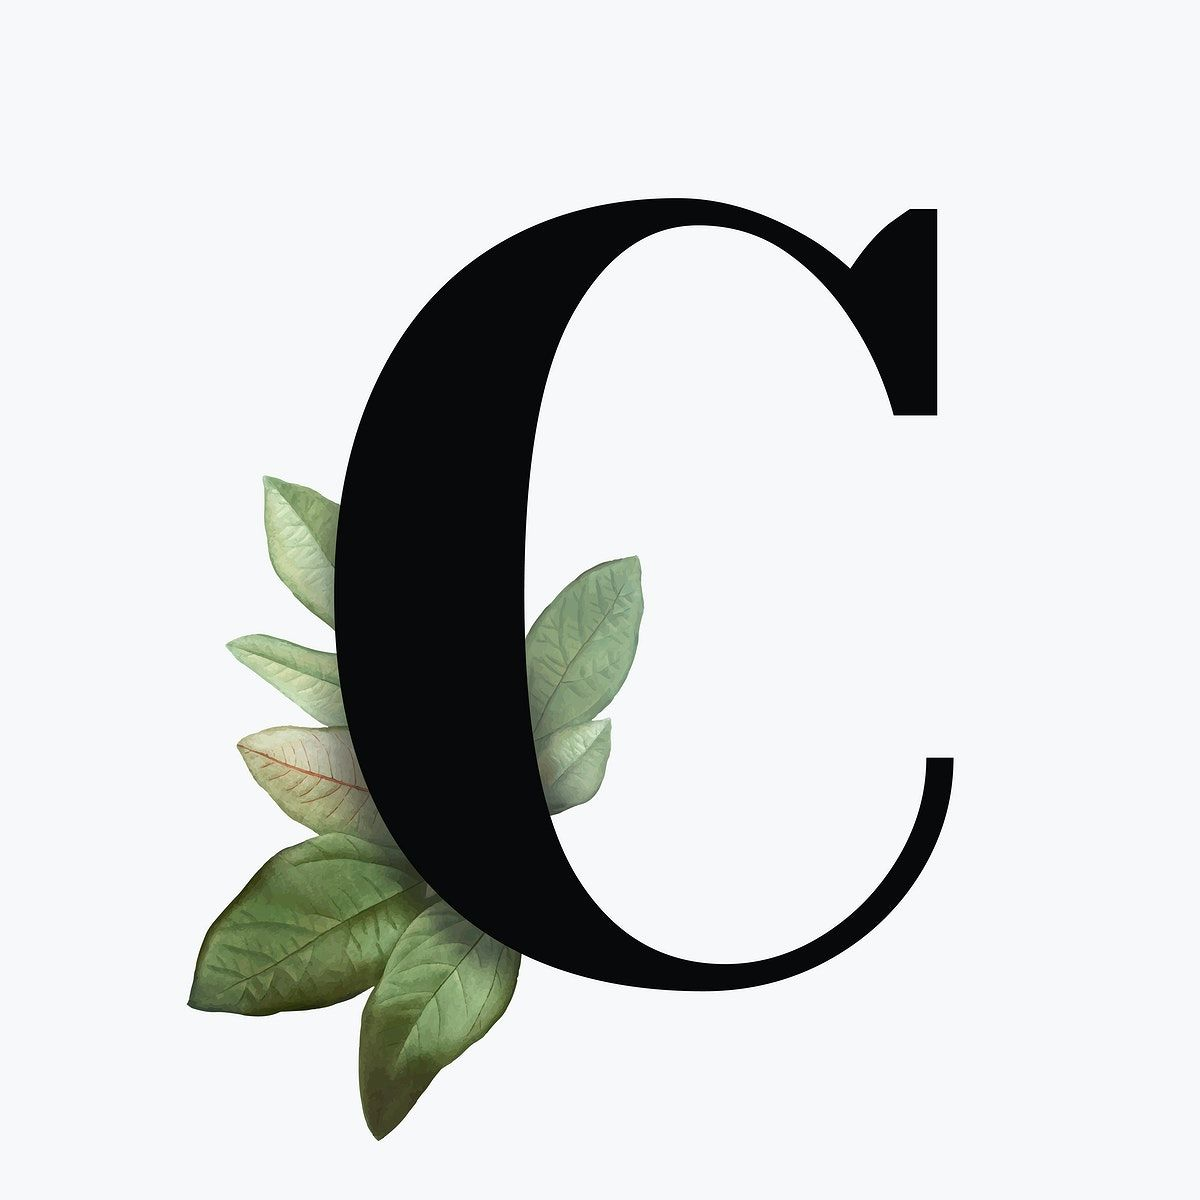 Botanical Capital Letter C Font Design Free Image By Rawpixel Com Aum Lettering Alphabet Fonts Lettering Letter C